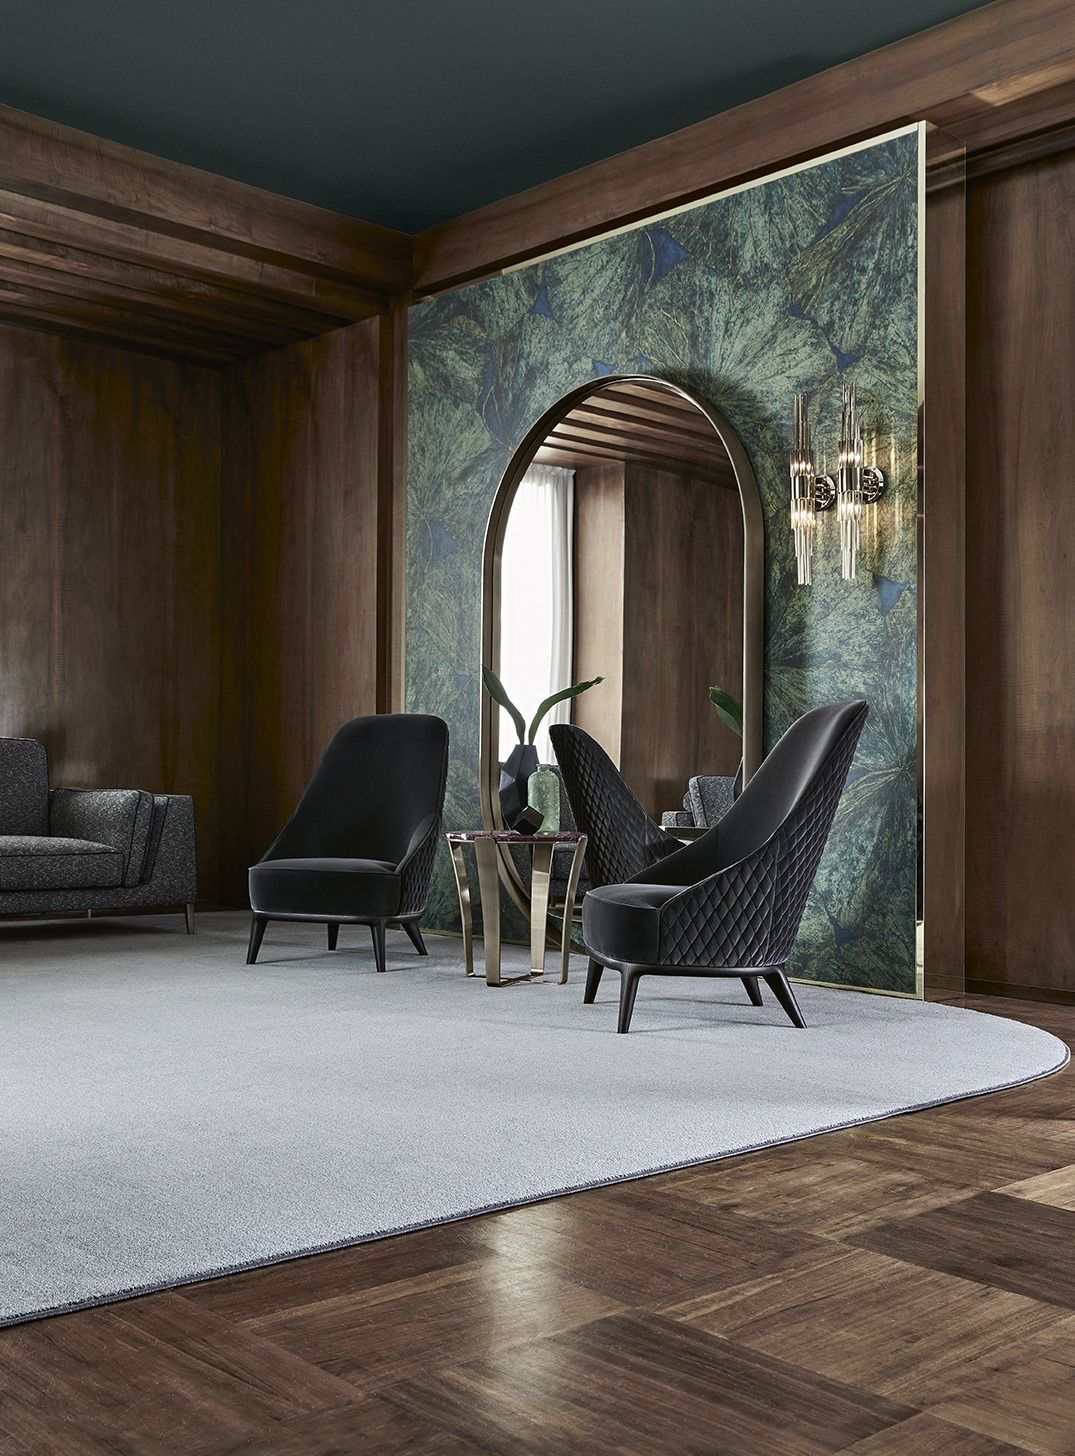 Opera Contemporary Leslie Armchair A High Comfortable Bac Contemporary Designers Furniture Da Vinci Lifestyle Contemporary Interior Design Contemporary Furniture Design Luxury Interior